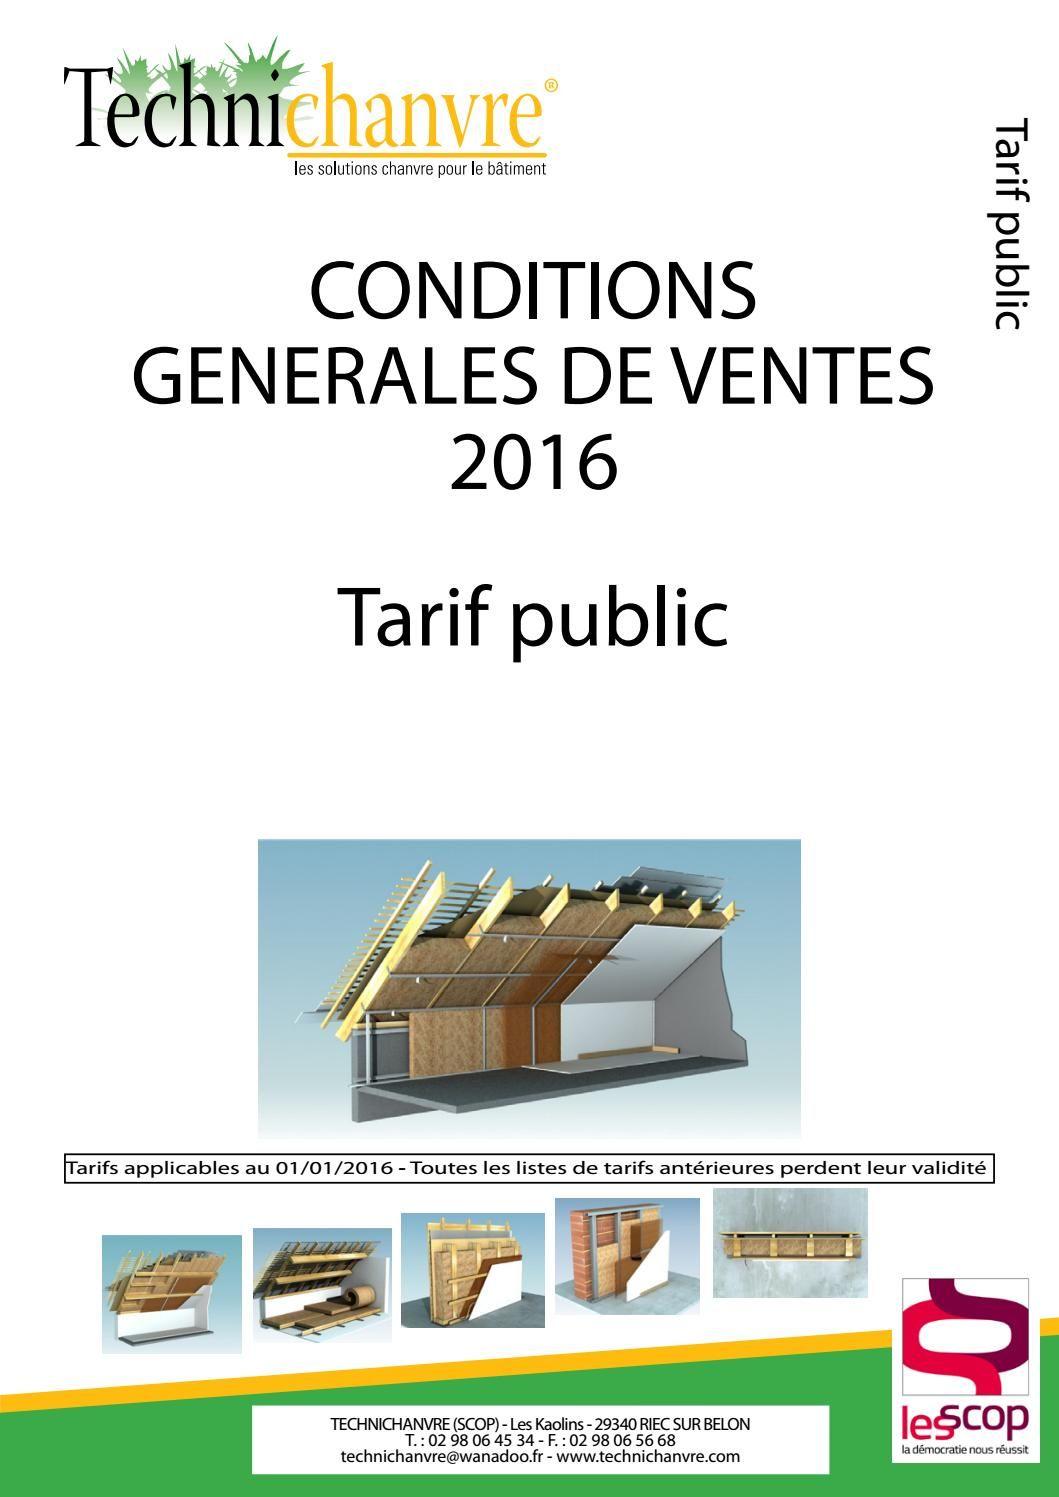 Tarifs public 2016 - particular pricelist 2016